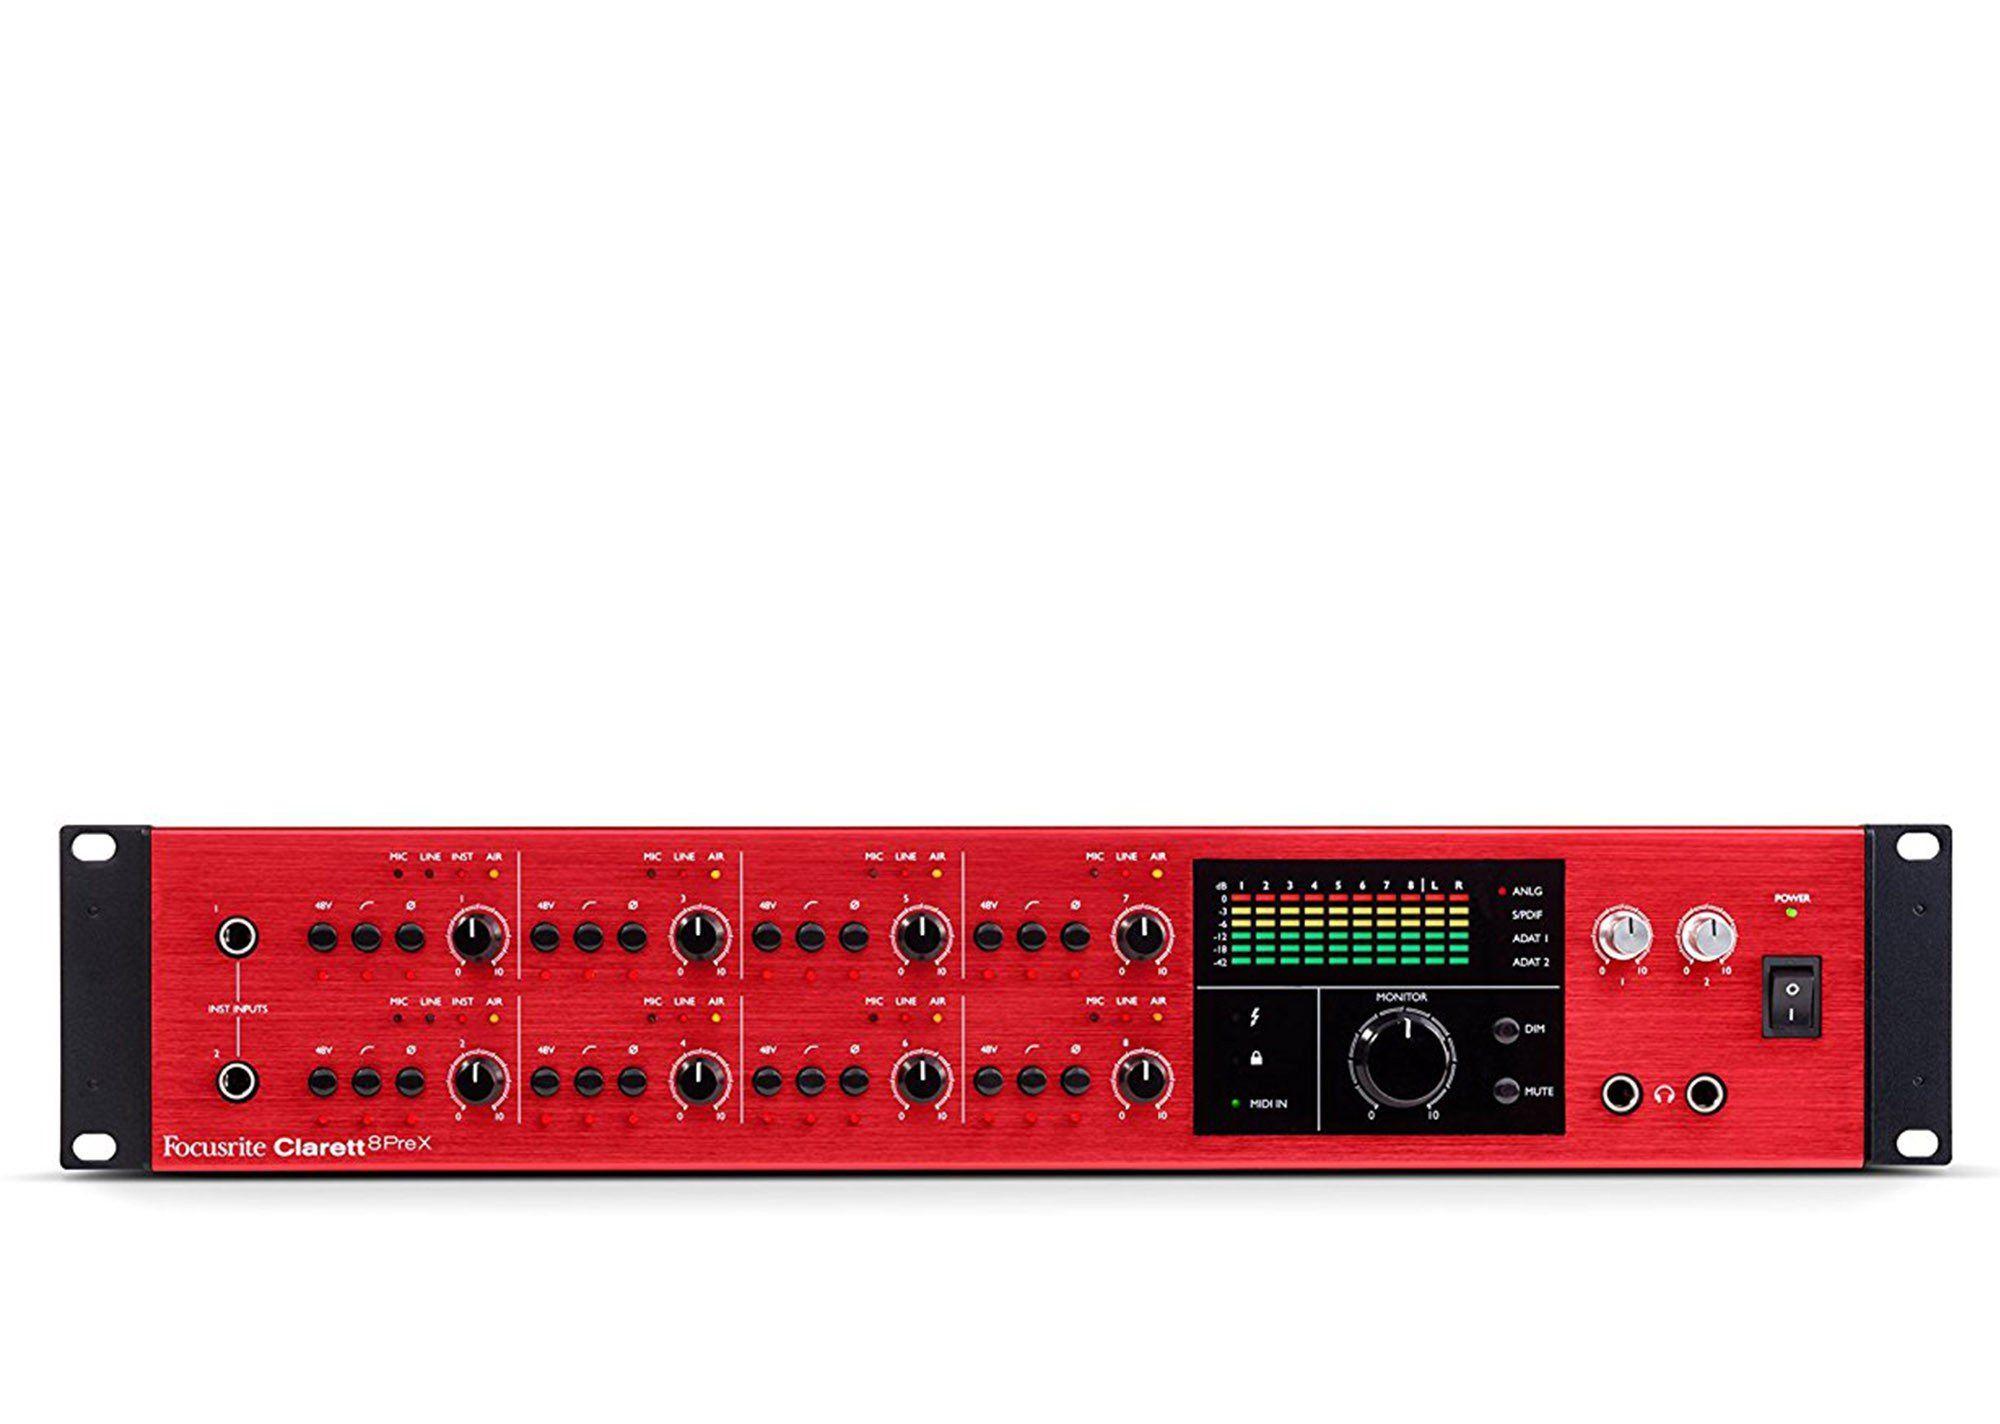 Focusrite Clarett 8PreX Interface de Áudio 8-PreX 26x28 ADAT 24-Bit 192-Khz Rack